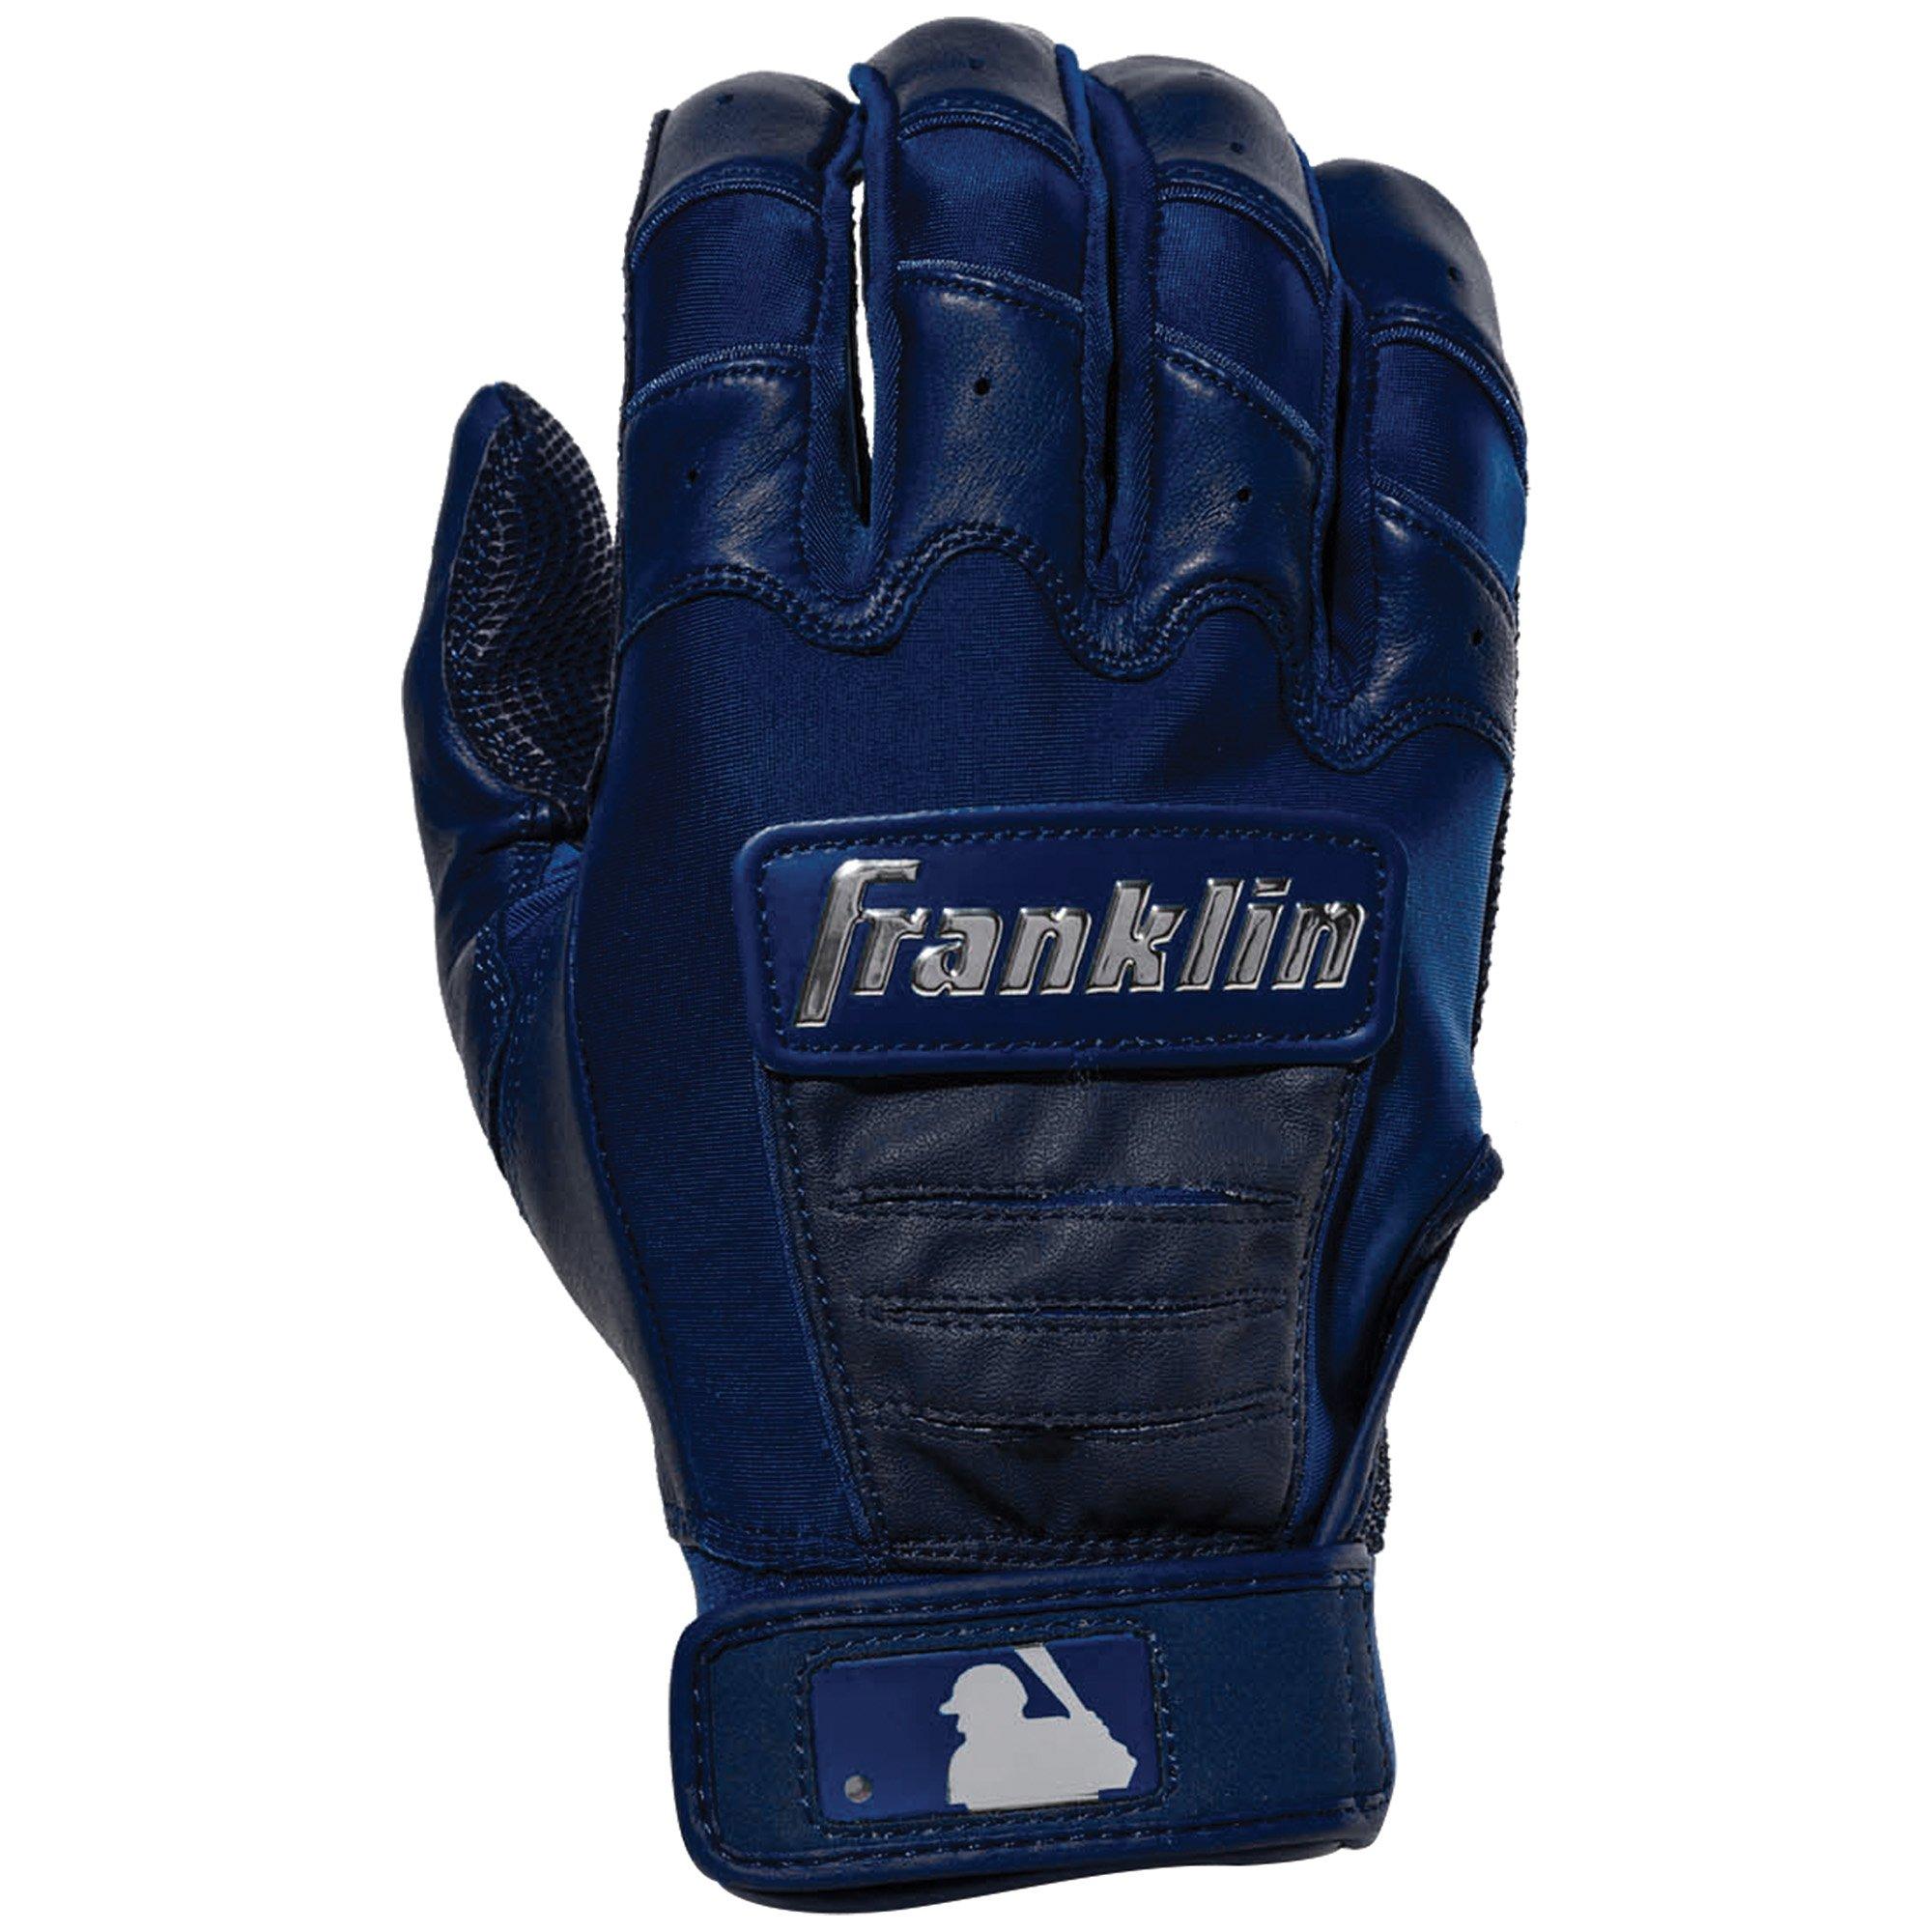 Franklin Sports CFX Pro Full Color Chrome Series Batting Gloves CFX Pro Full Color Chrome Batting Gloves, Navy, Adult Small by Franklin Sports (Image #2)